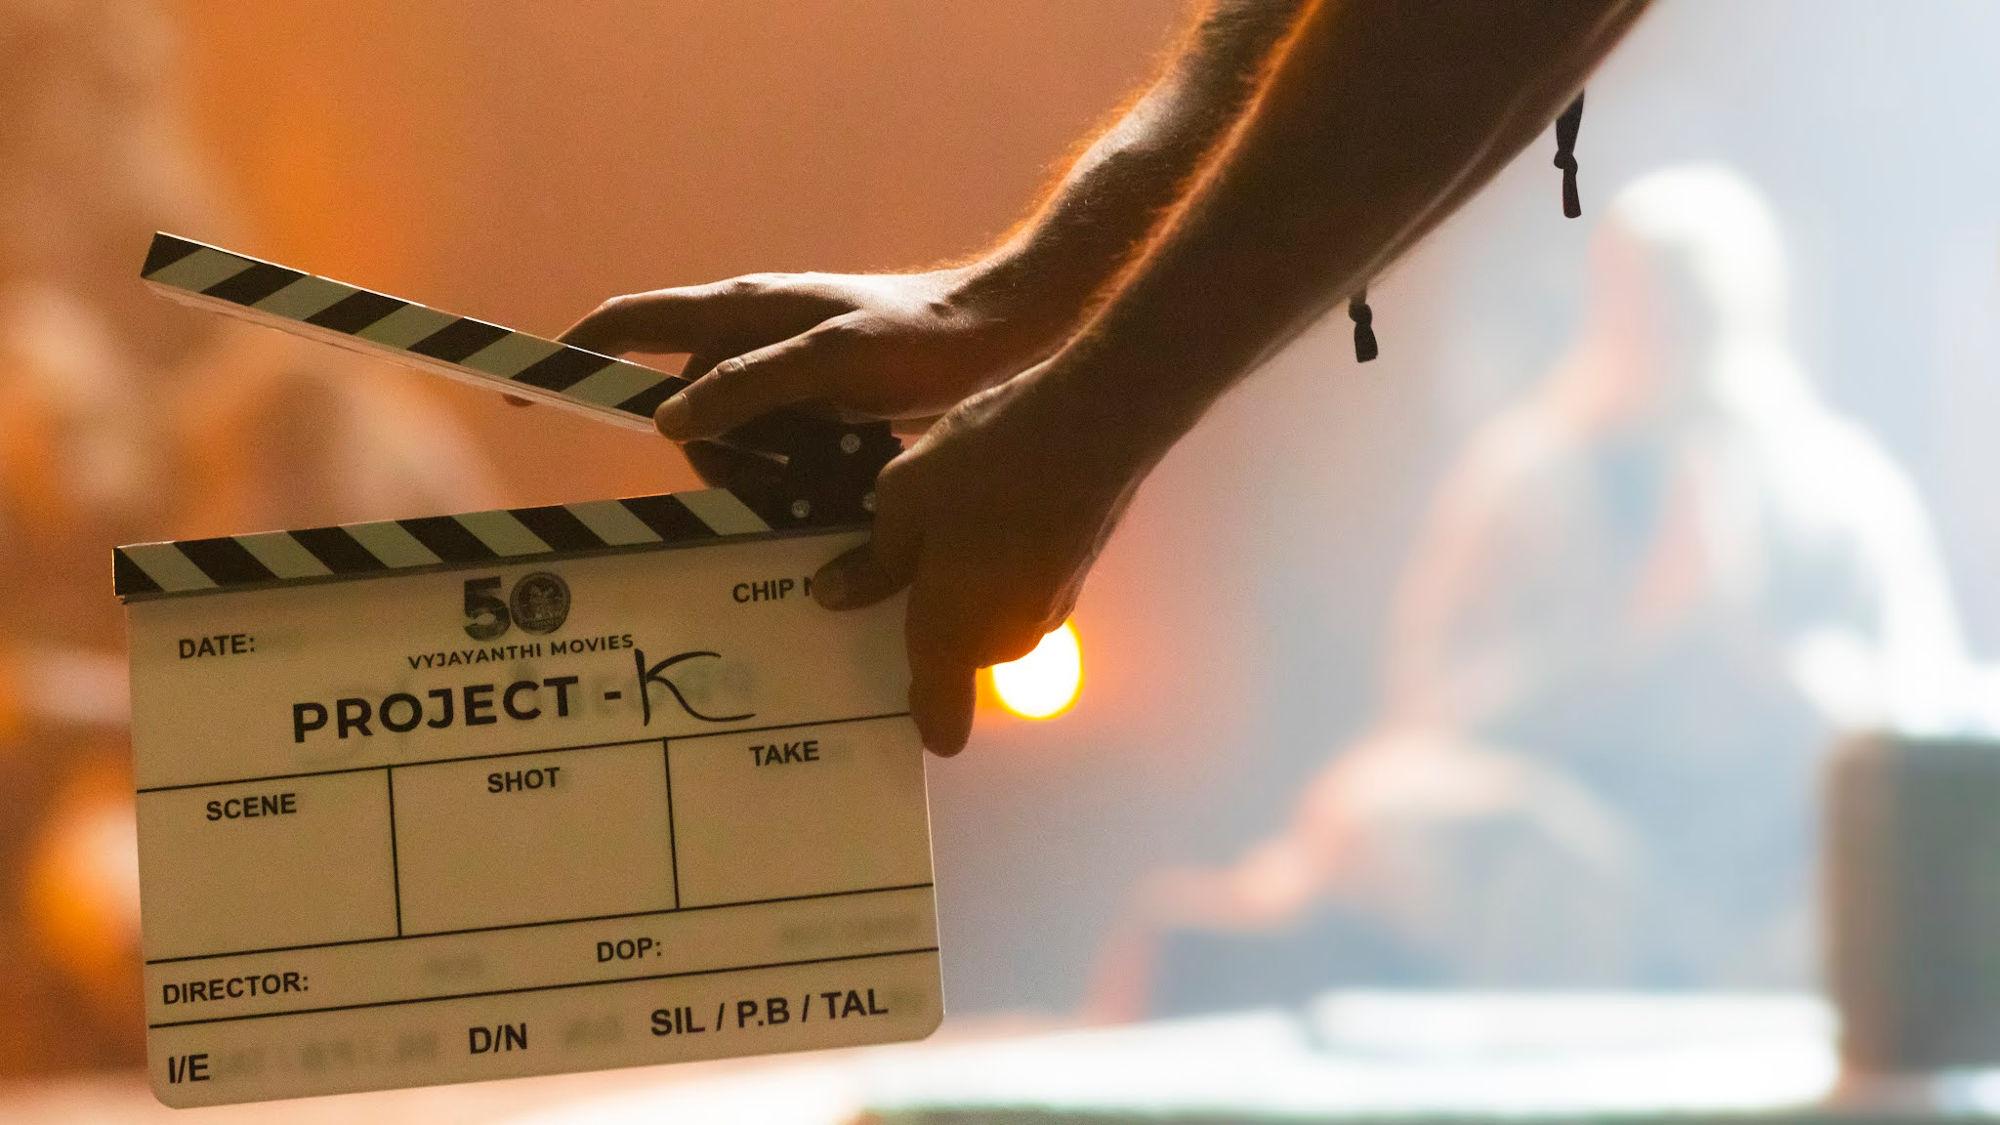 Amitabh Bachchan Starts Shooting For Prabhas, Deepika Padukone, Nag Ashwin, Vyjayanthi Movies Film